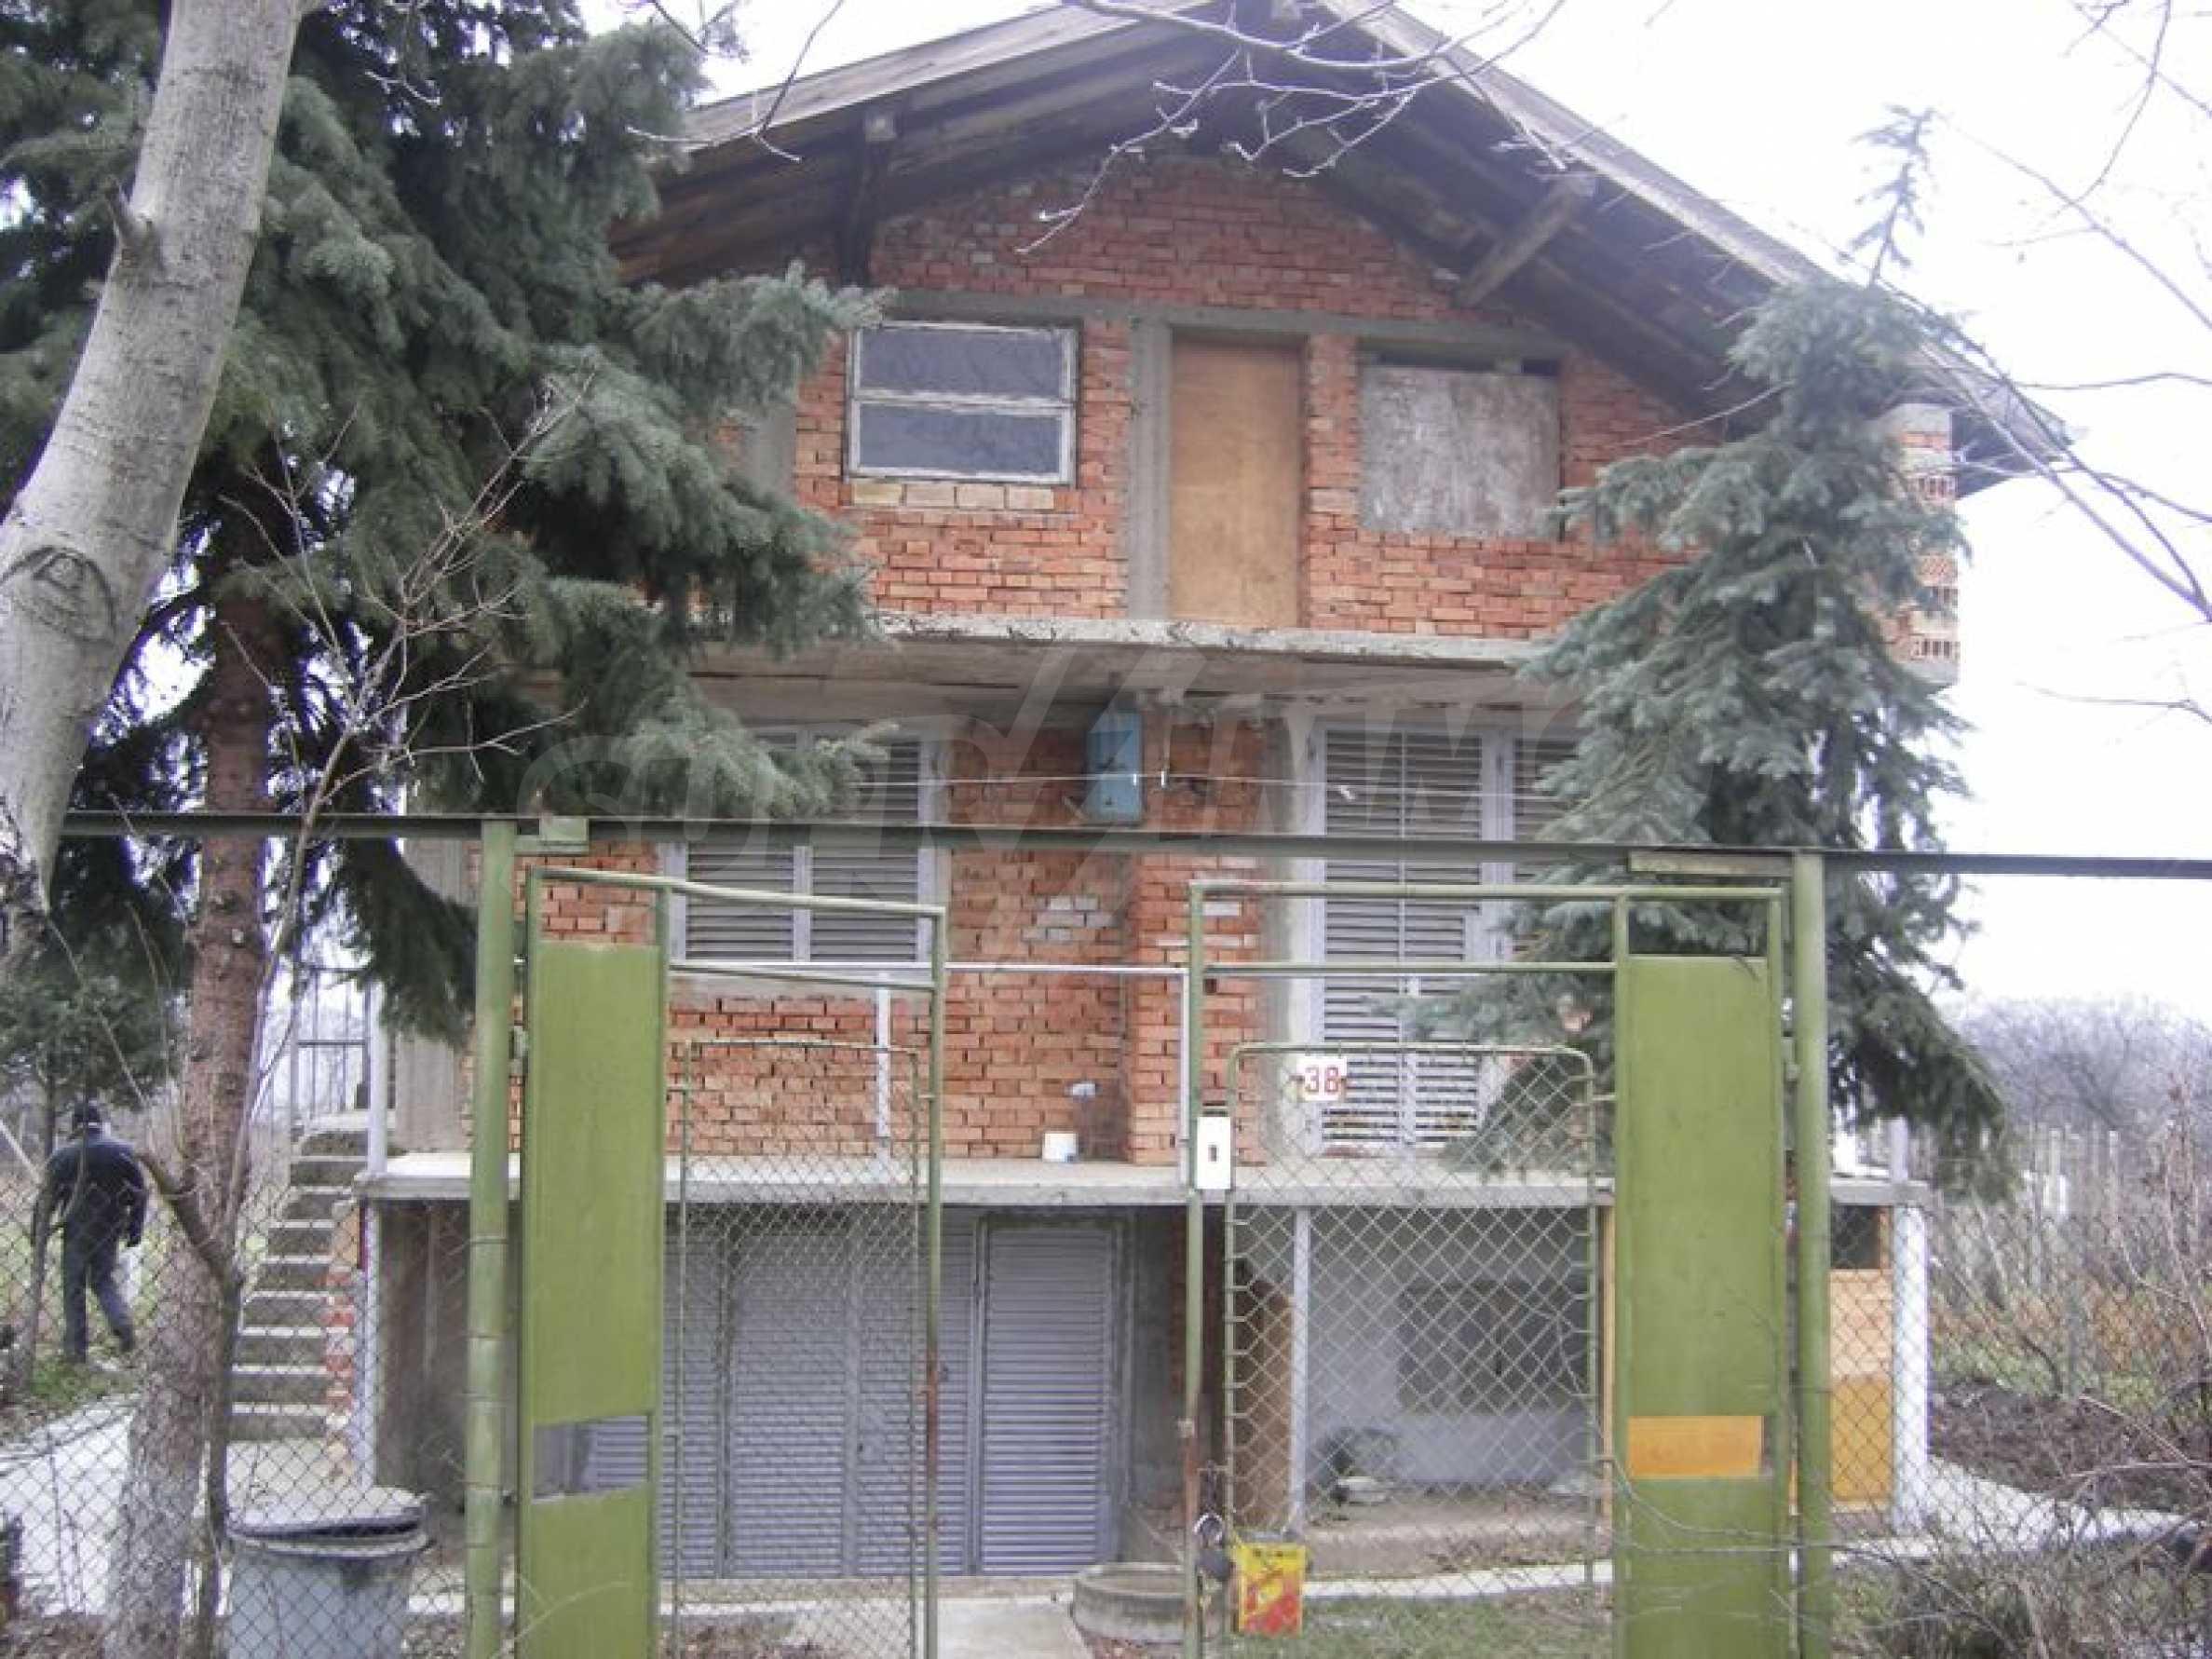 House for sale in Shtarklevo village 2